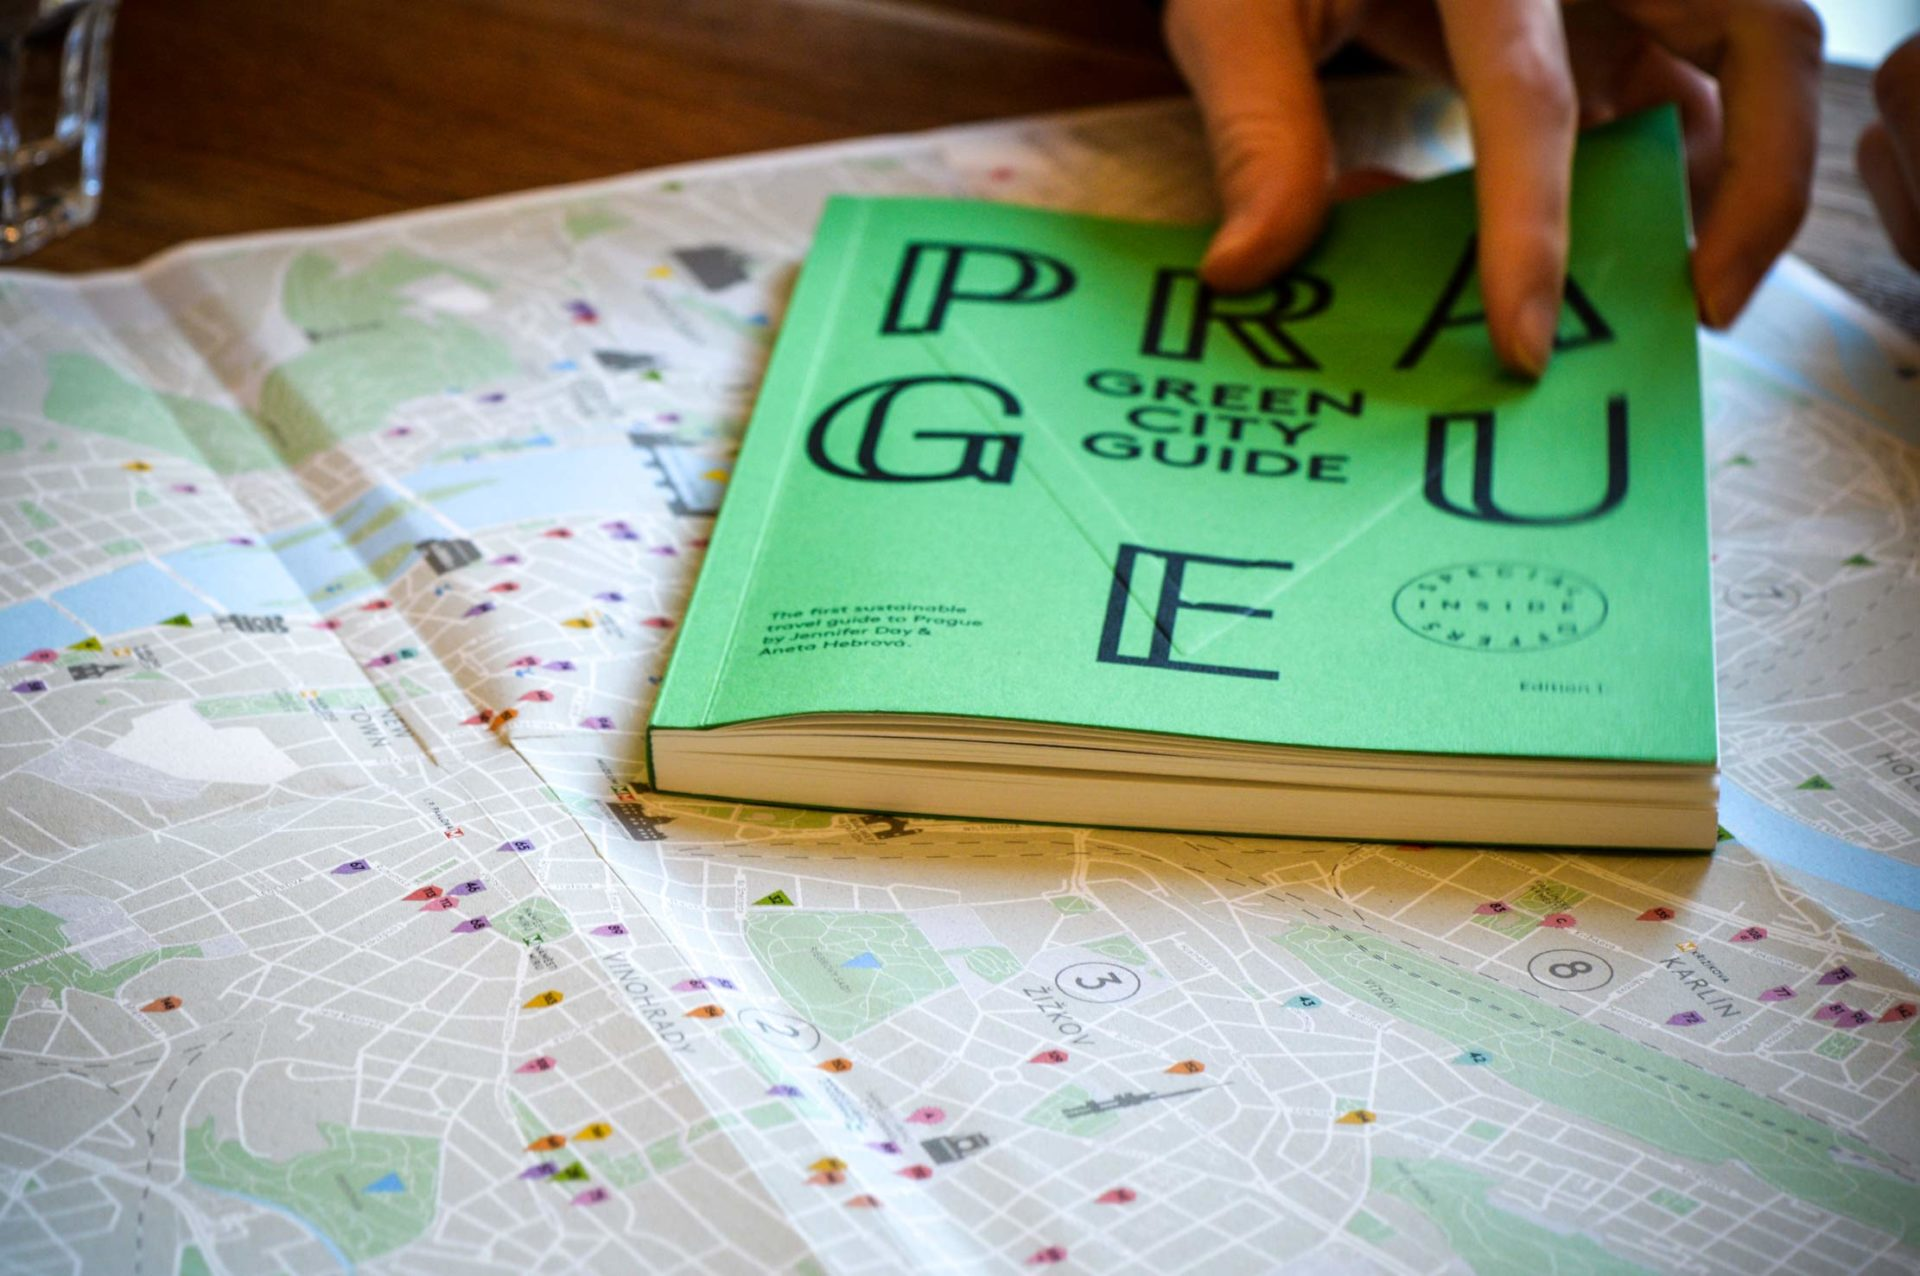 prague_green_city_guide_samosebou_udrzitelny_zivotny_styl